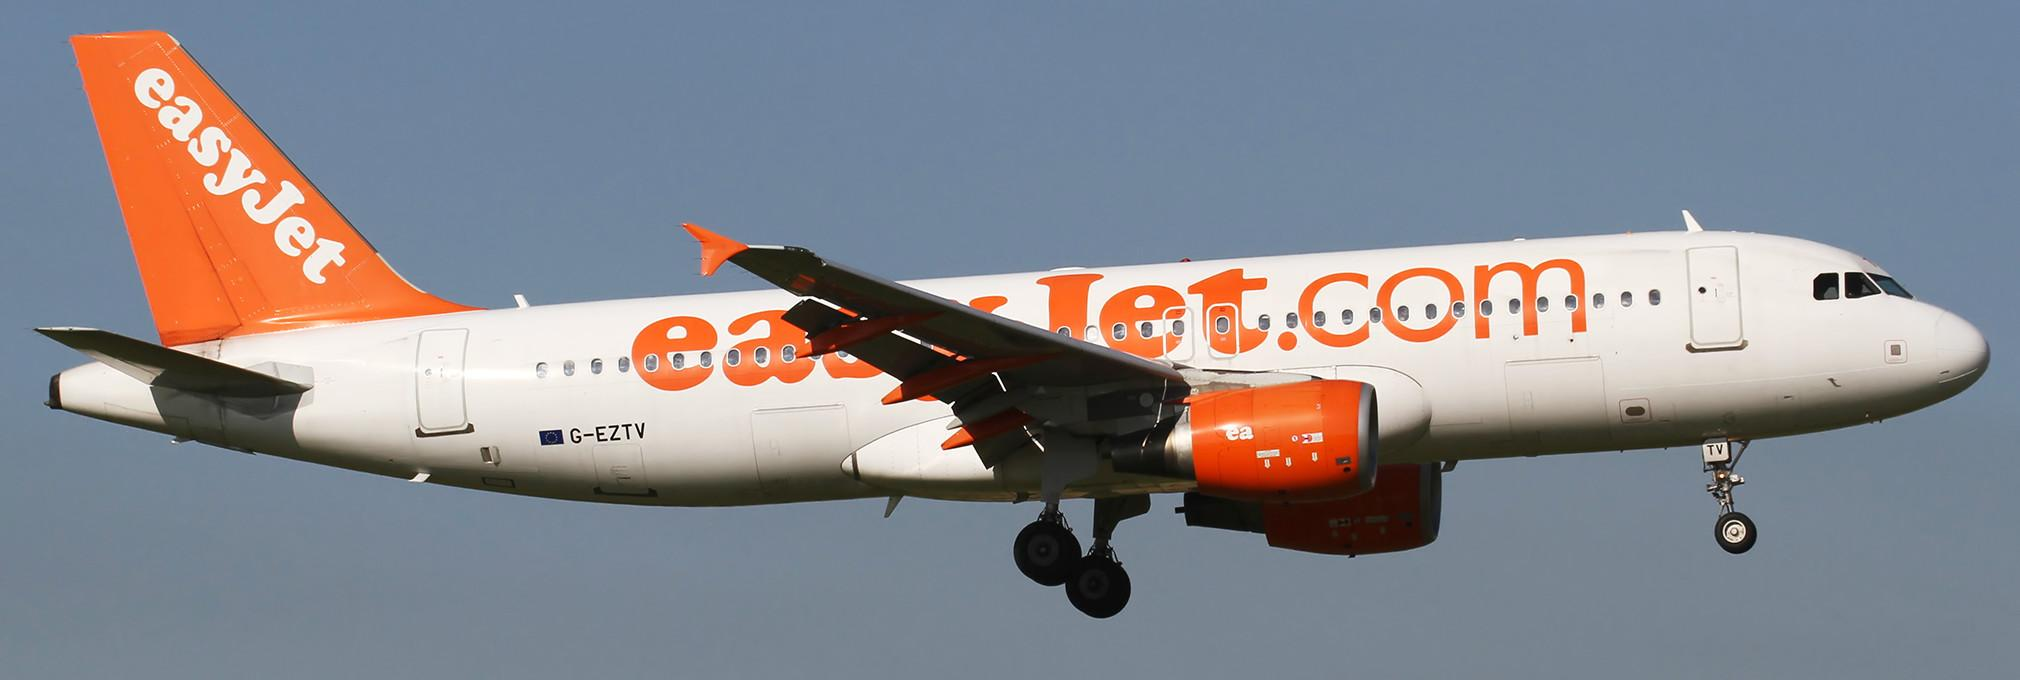 easyJet Reviews and Flights - TripAdvisor